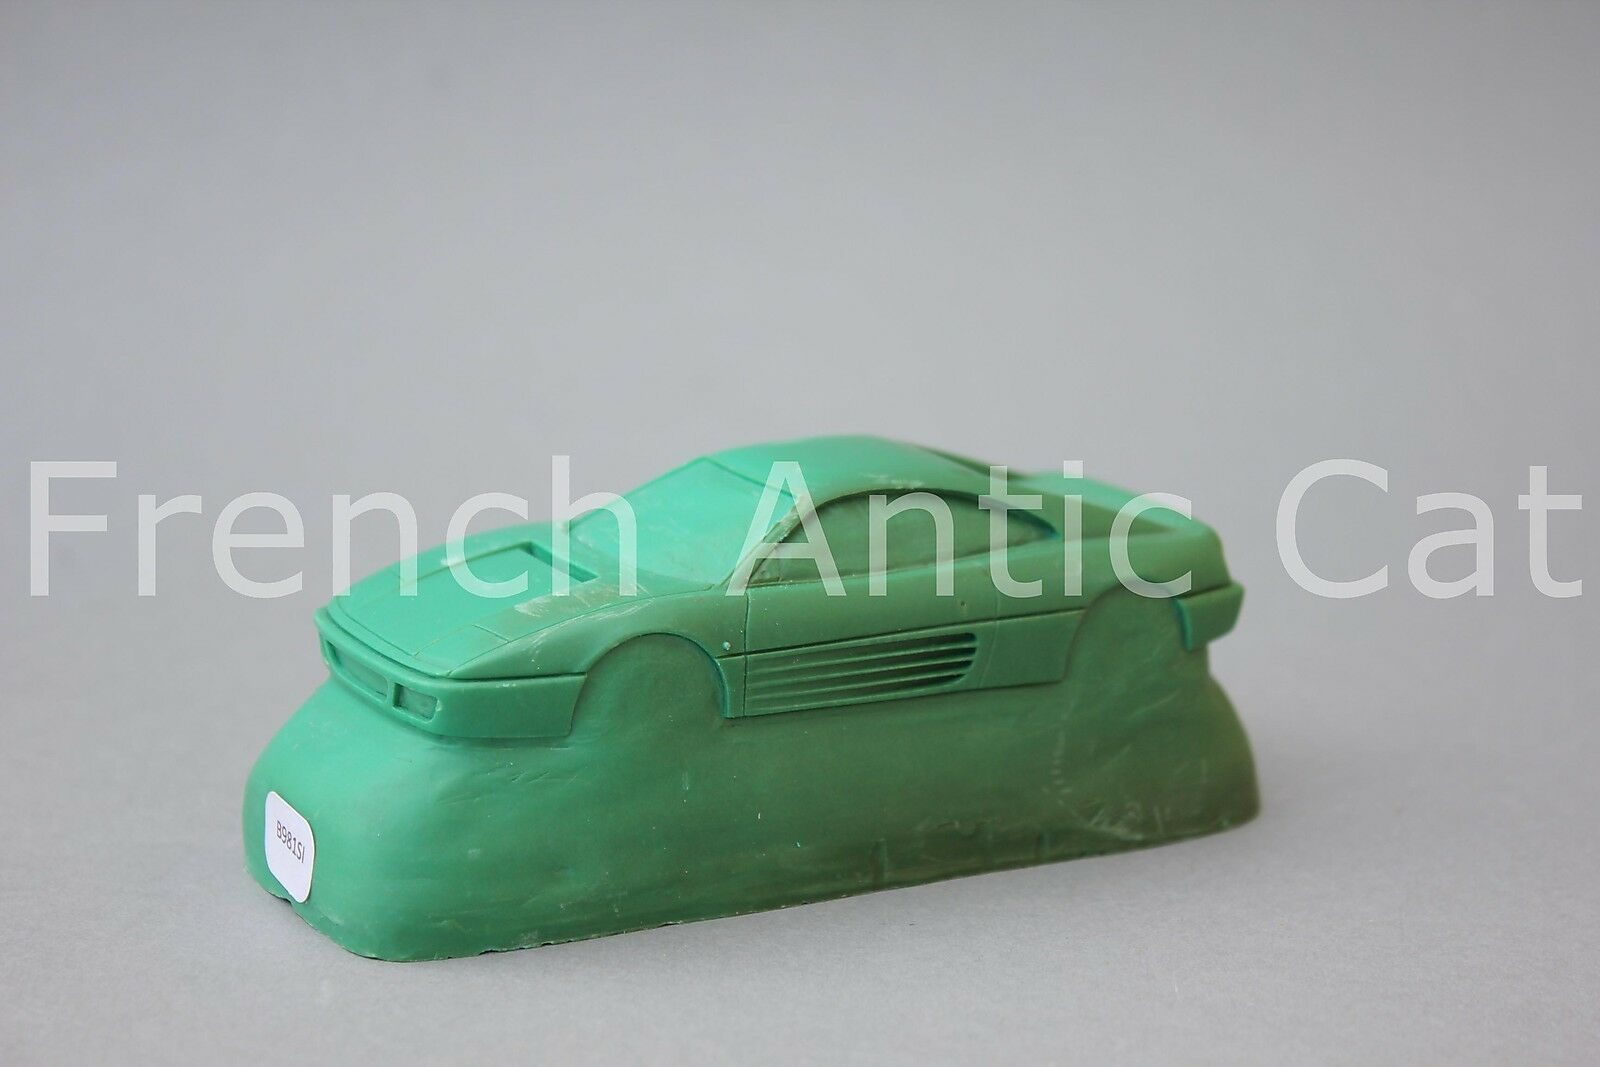 Rare matrice moule résine FERRARI F 348 GTB 1 43 Heco modeles voiture F348 SI